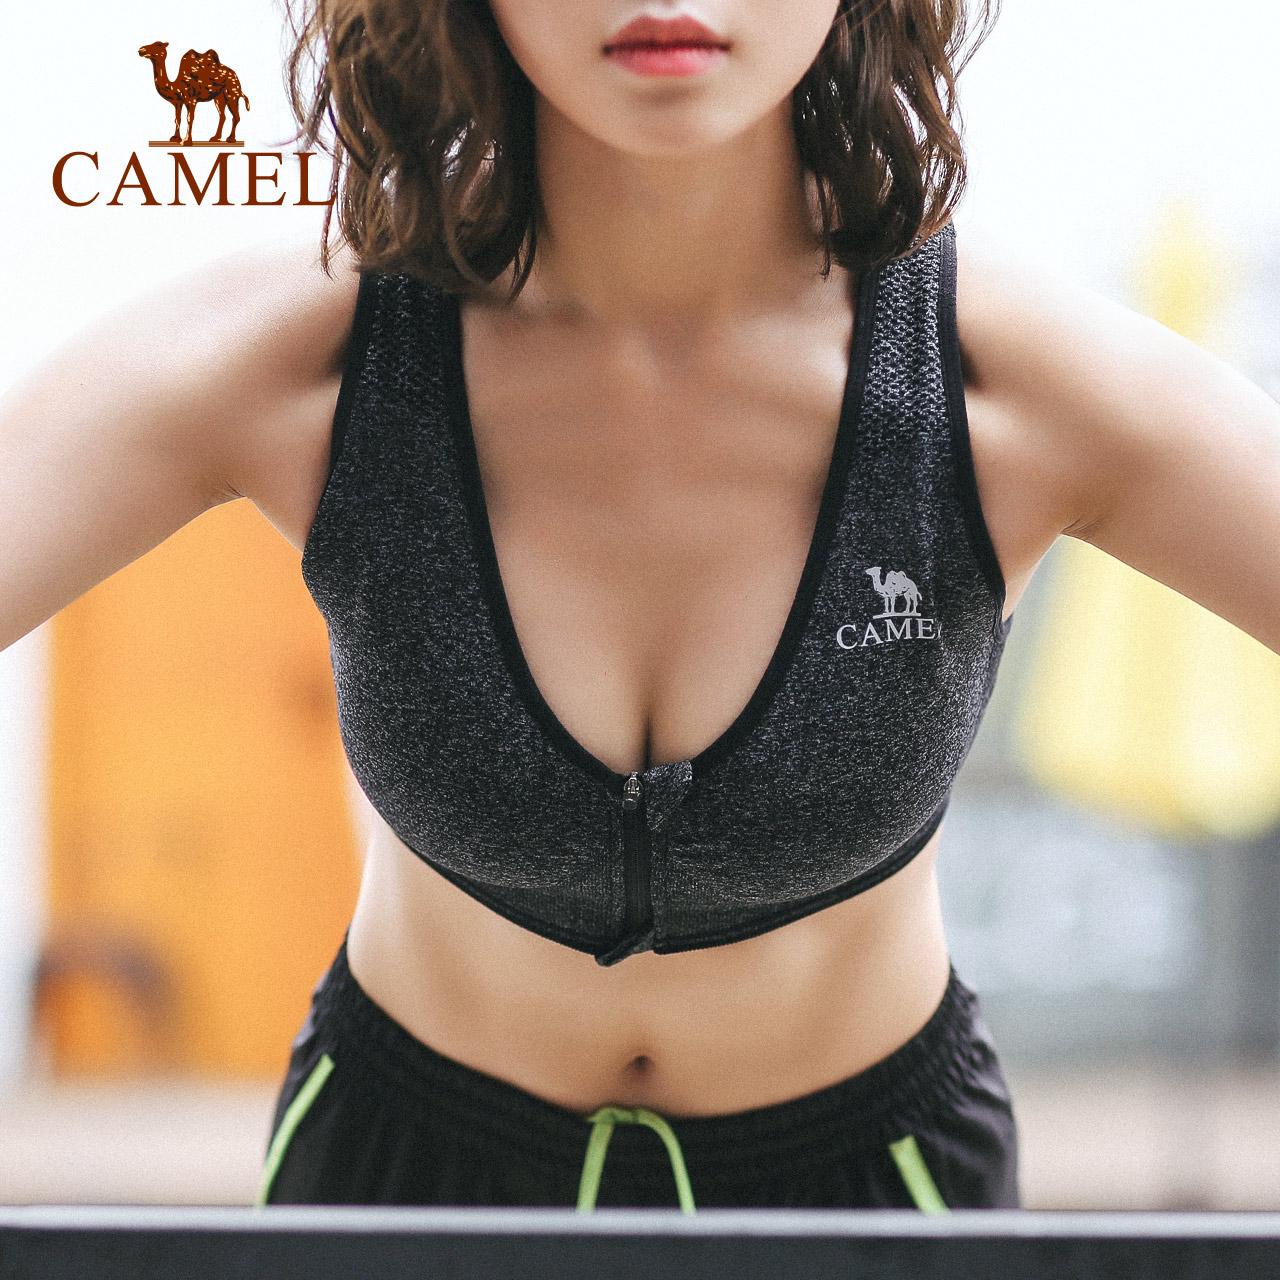 cde14e852efe ... underwear female shockproof running gather stereotypes wear yoga  fitness vest bra anti-sagging · Zoom · lightbox moreview · lightbox  moreview · lightbox ...